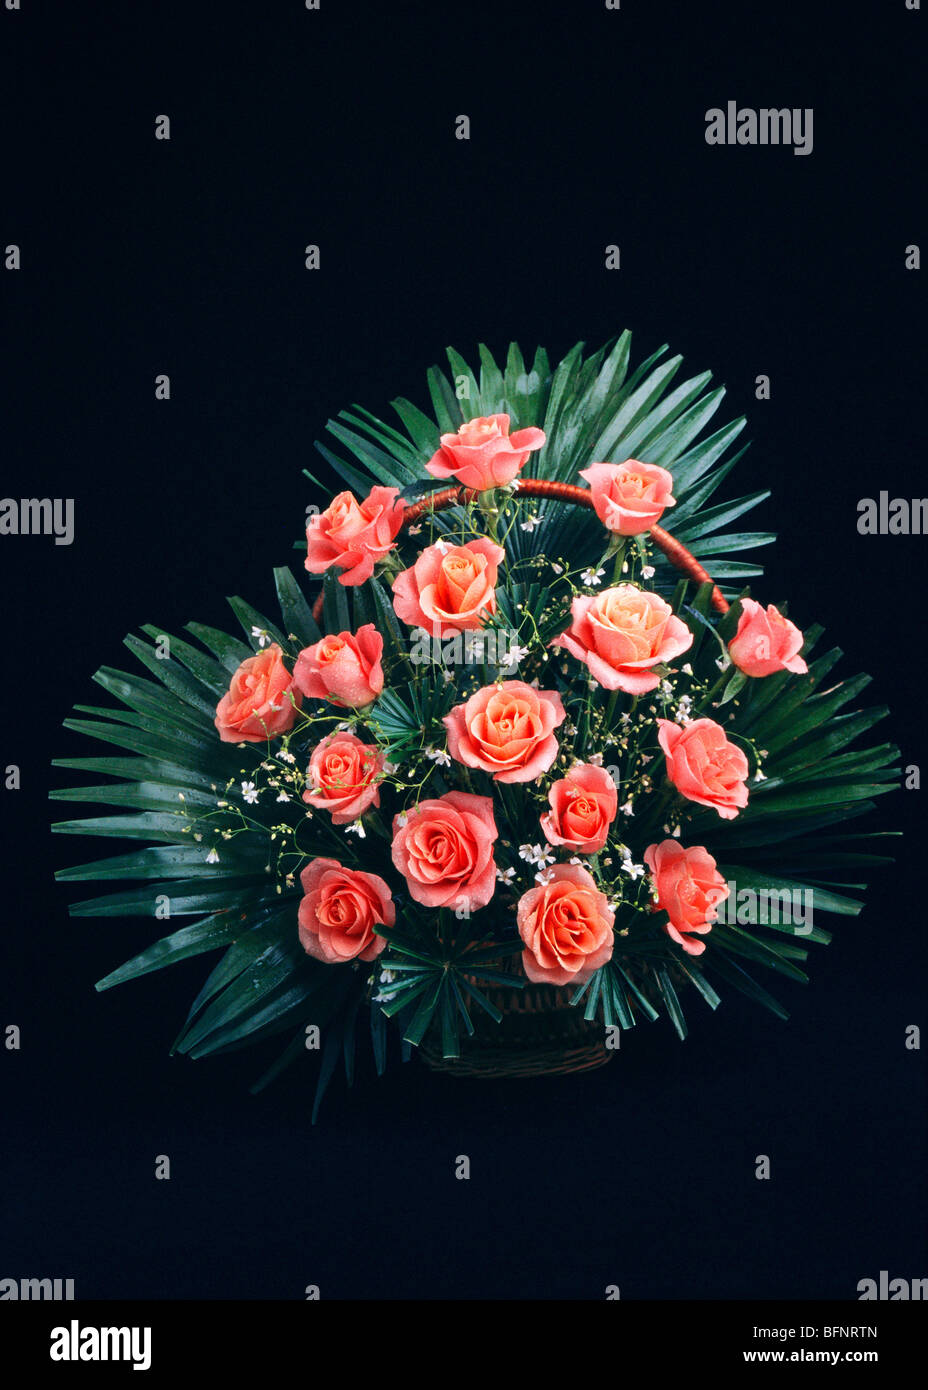 BDR 63001 : sixteen pink roses flower arrangement in bouquet on black background - Stock Image